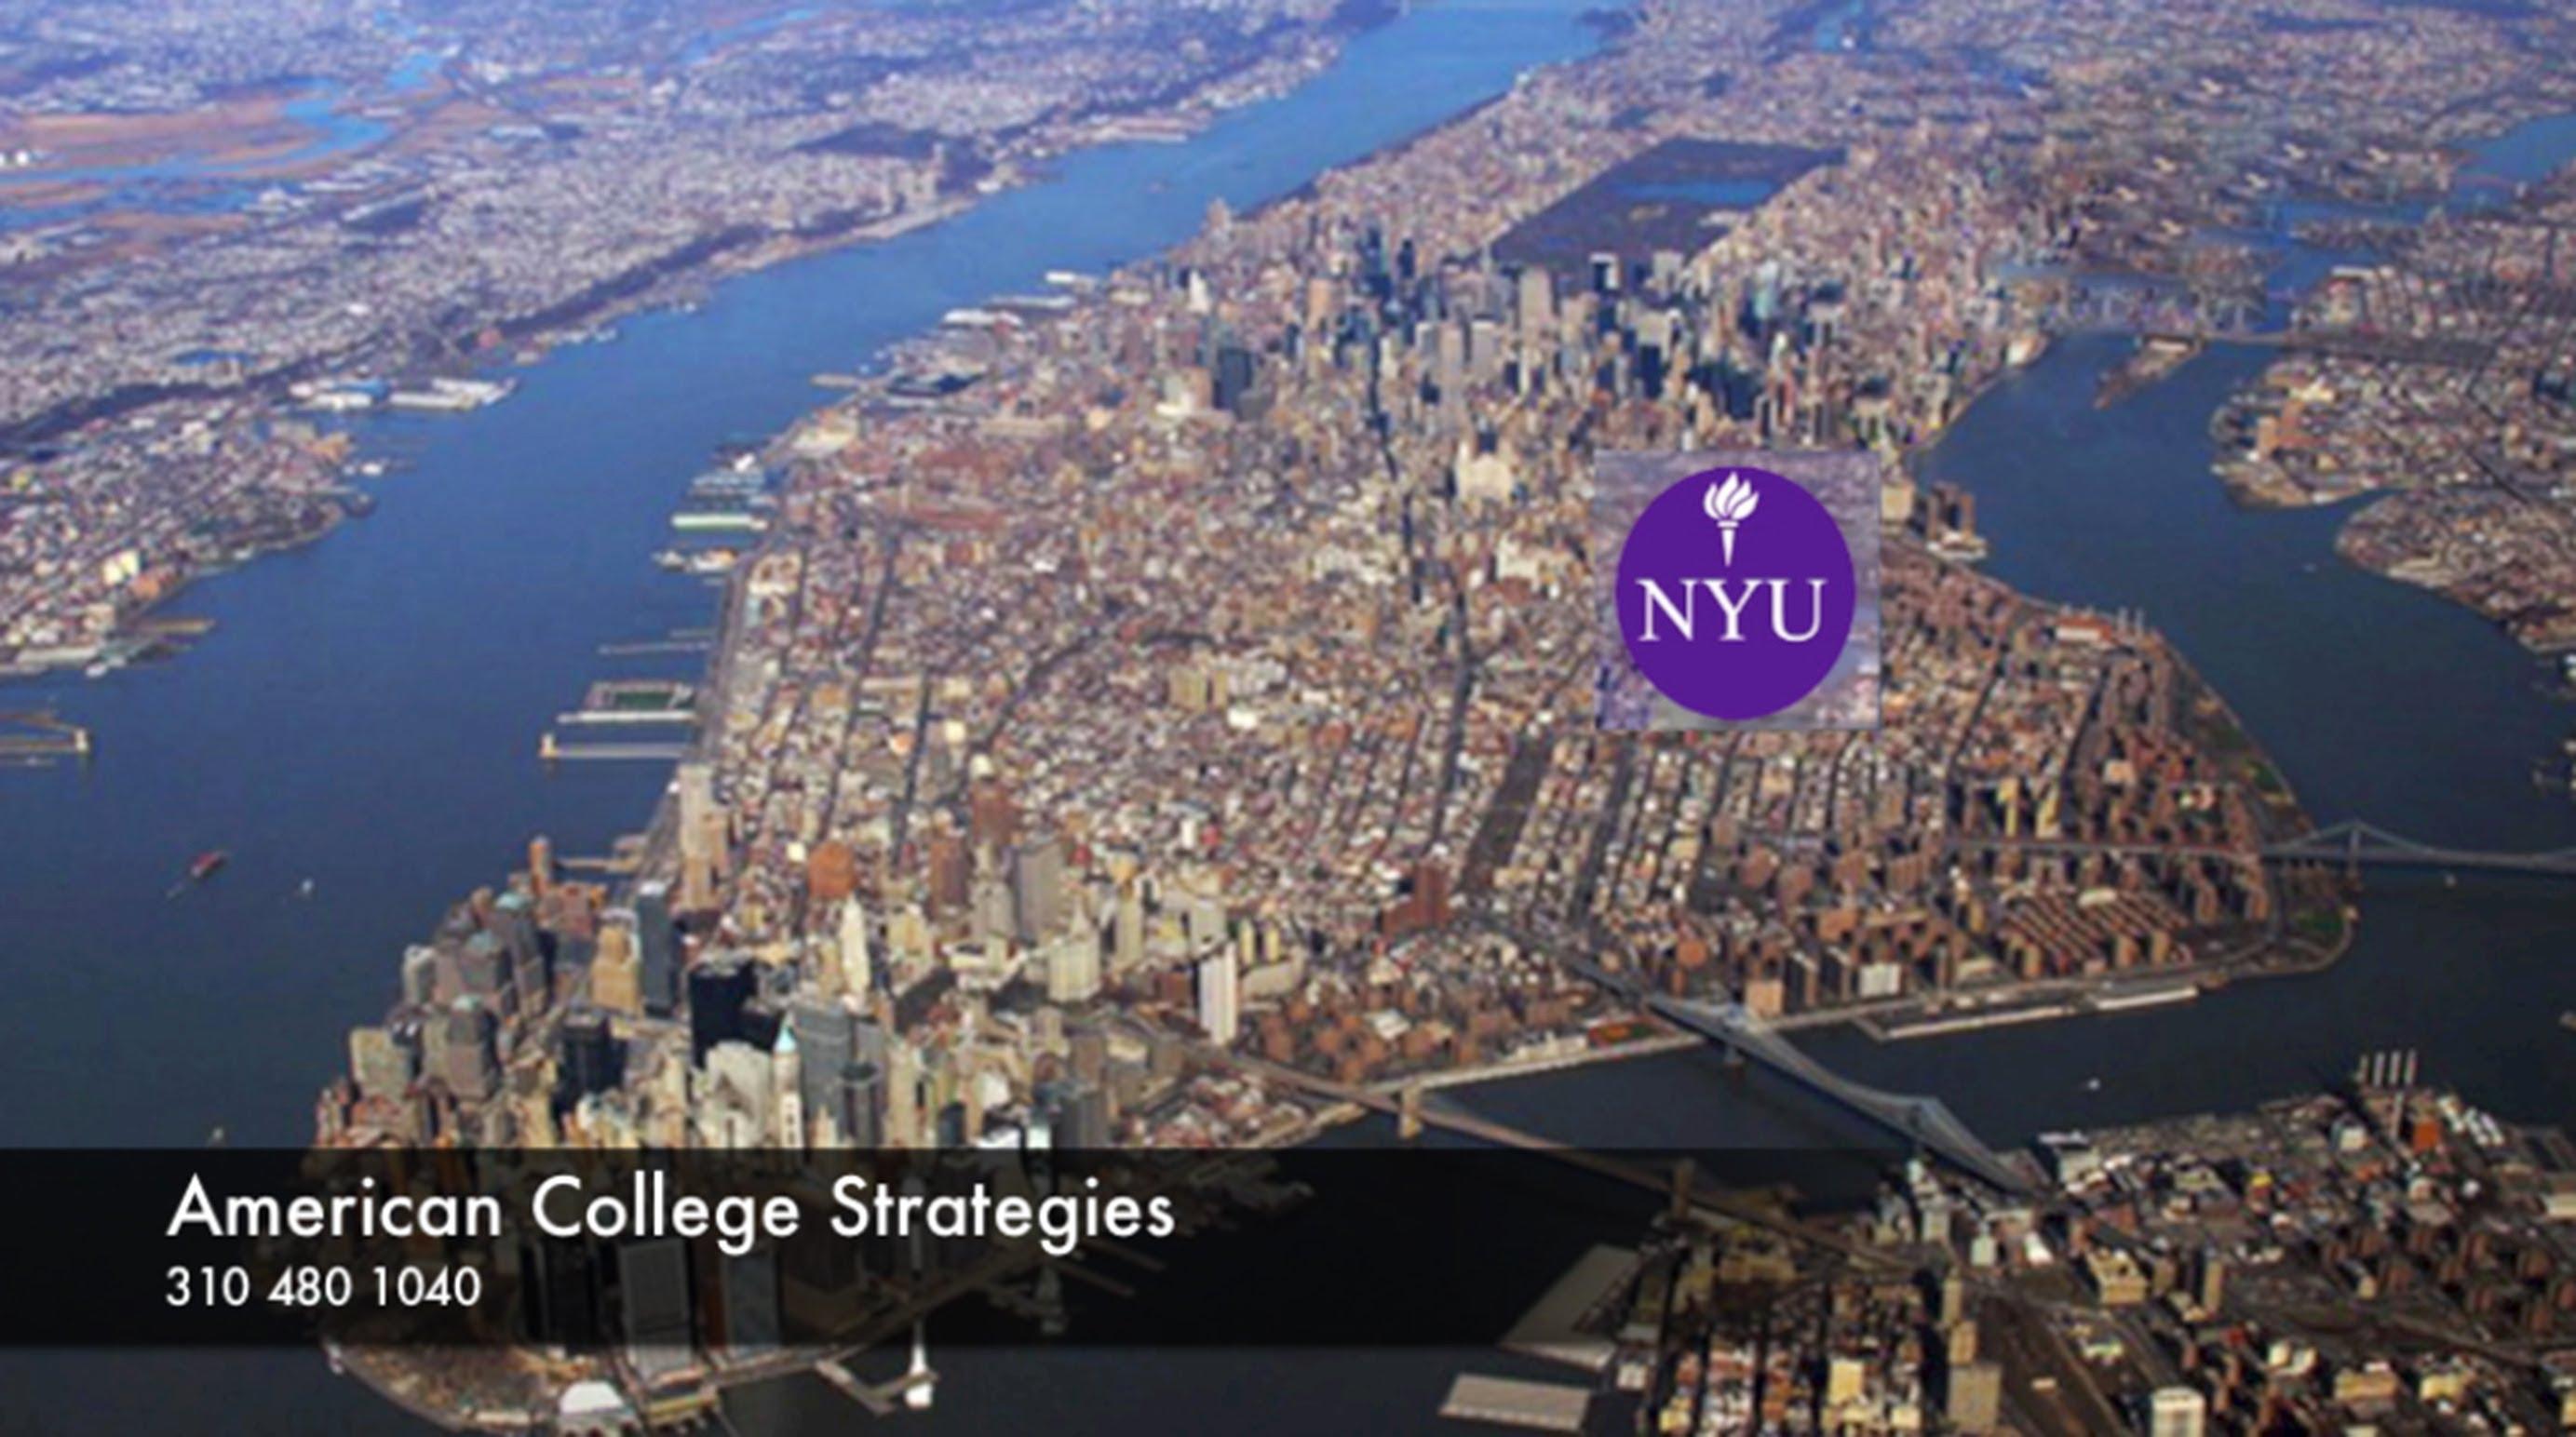 NYU - New York University - Campus visit with American College